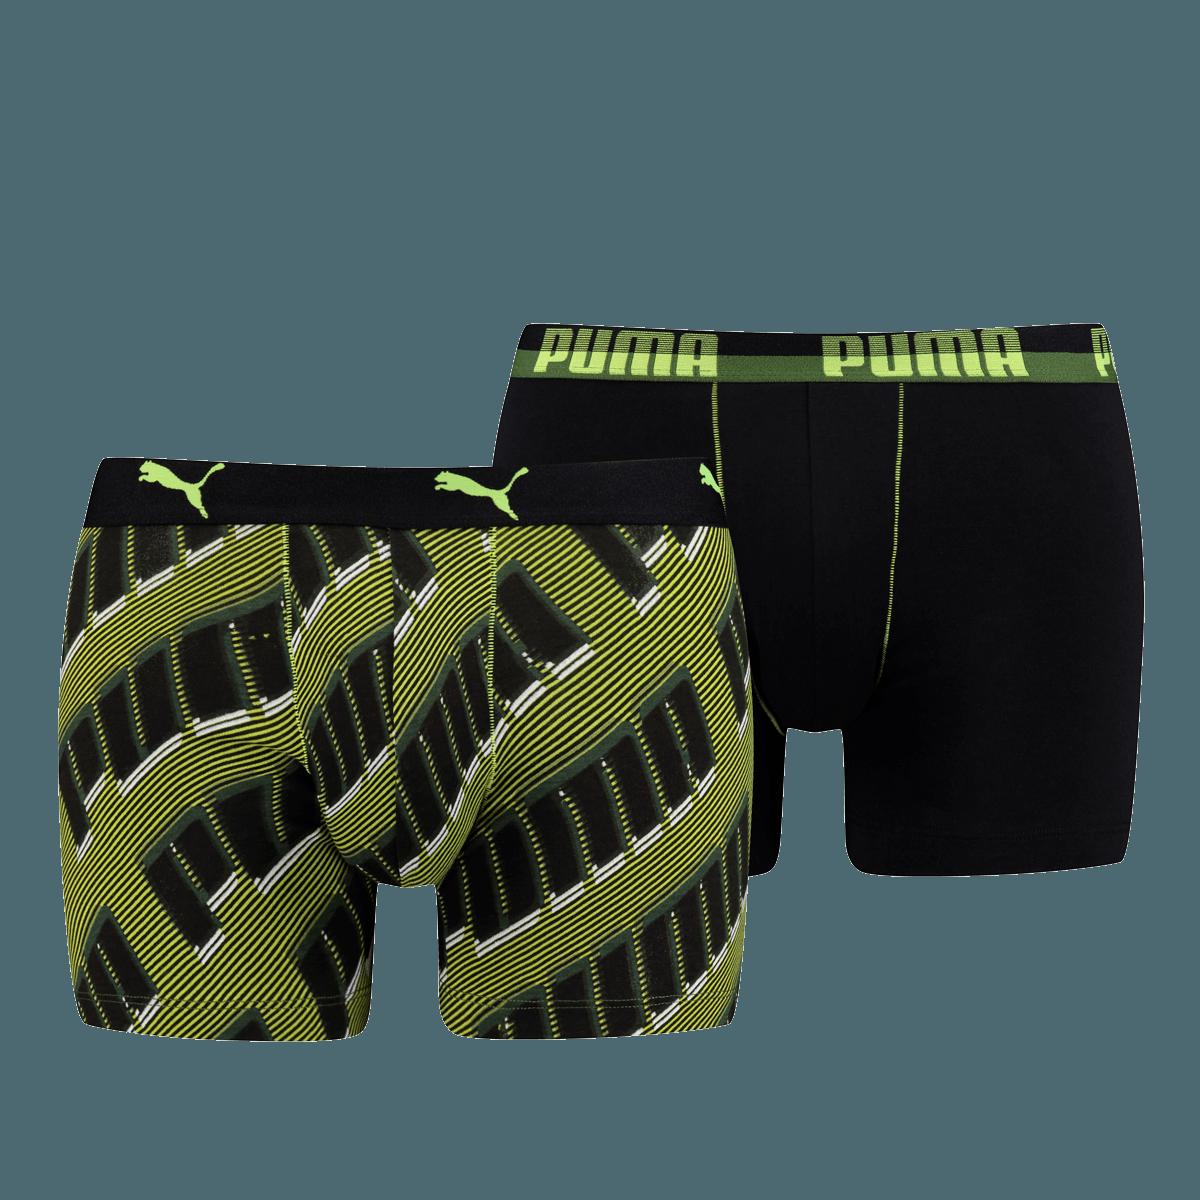 d232215f6da0c0 Puma Basic Boxer 2er Pack AOP WOR grün fluo/schwarz